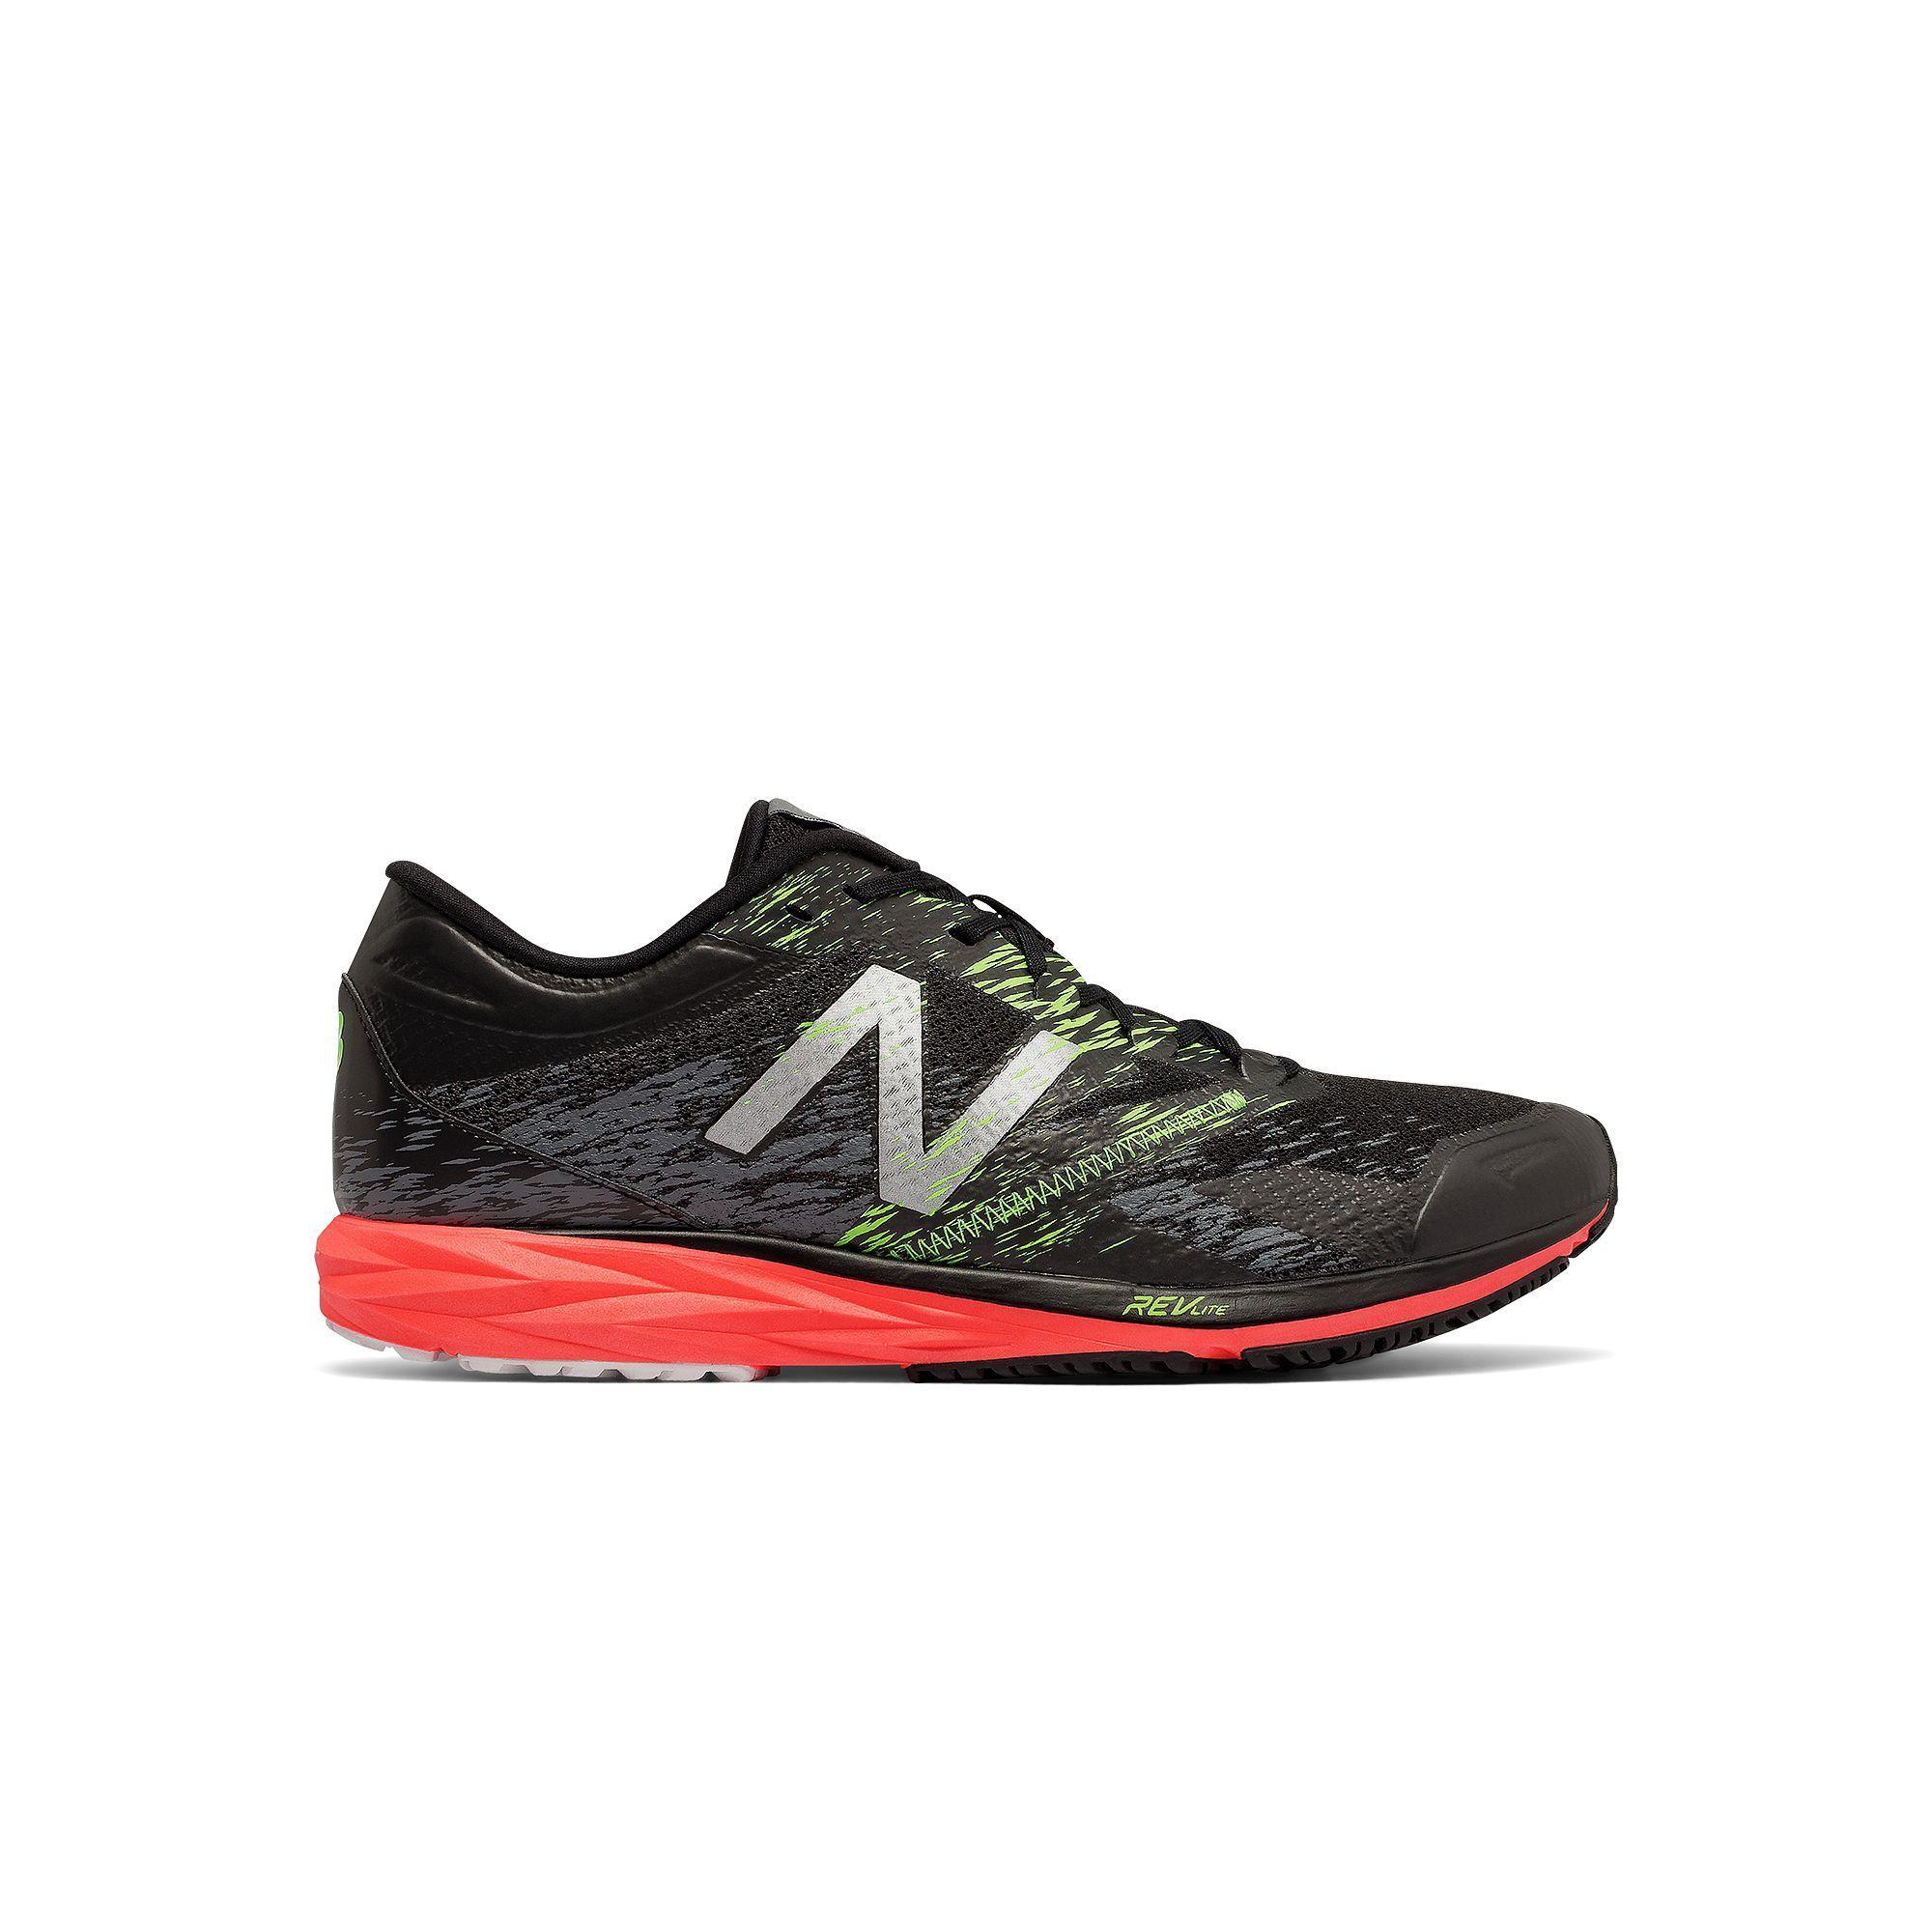 e5946b482c32 New Balance Strobe Speed Ride Men s Running Shoes